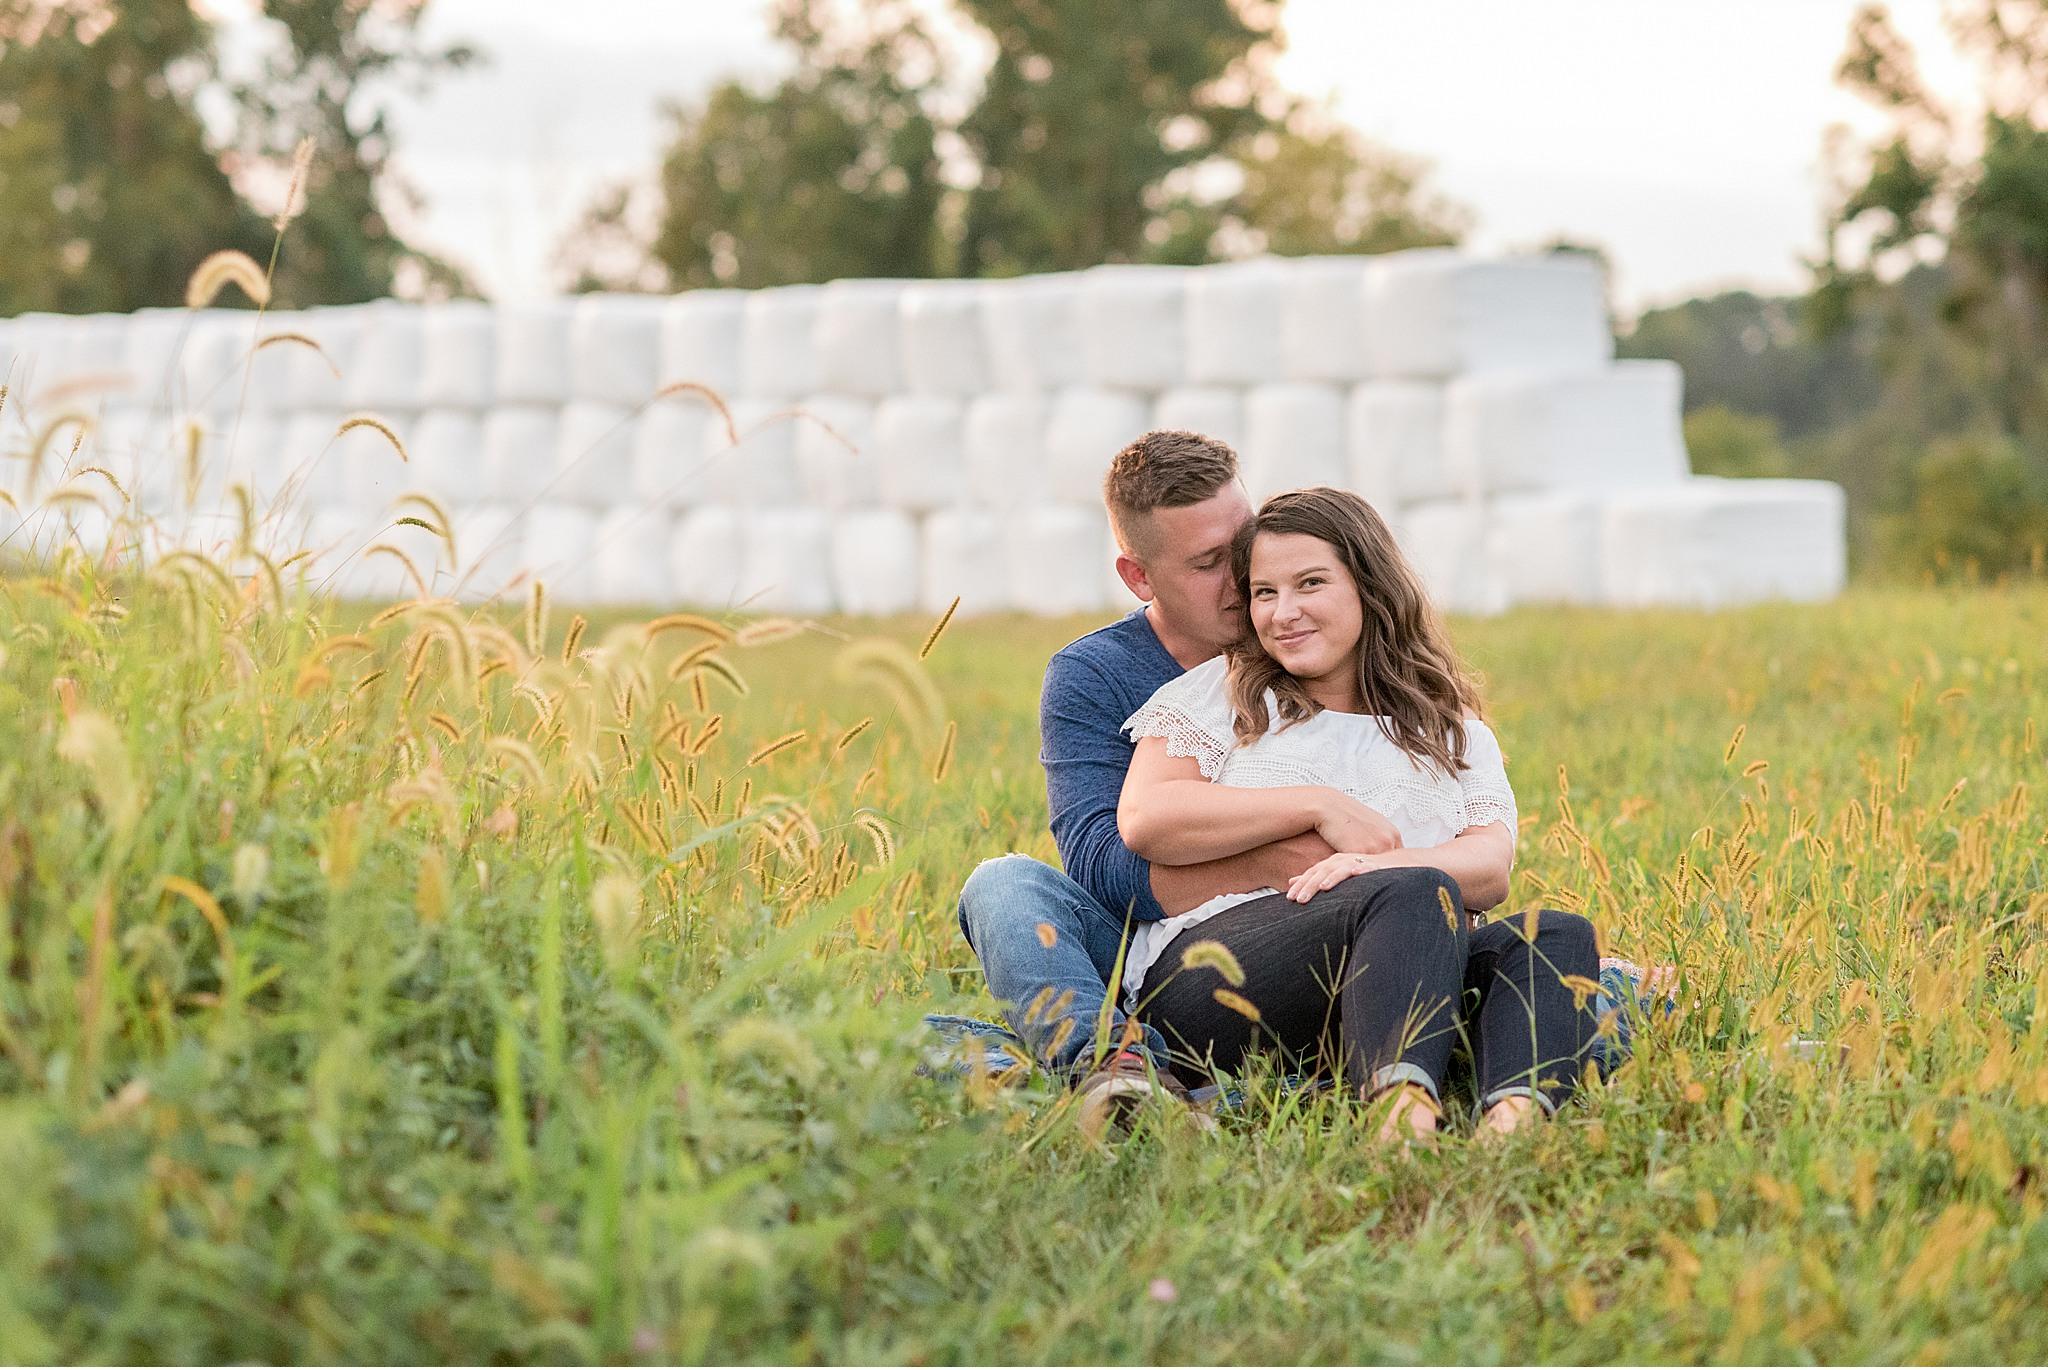 Tudbinks Greenhouse Lancaster PA wedding engagement photography_3980.jpg